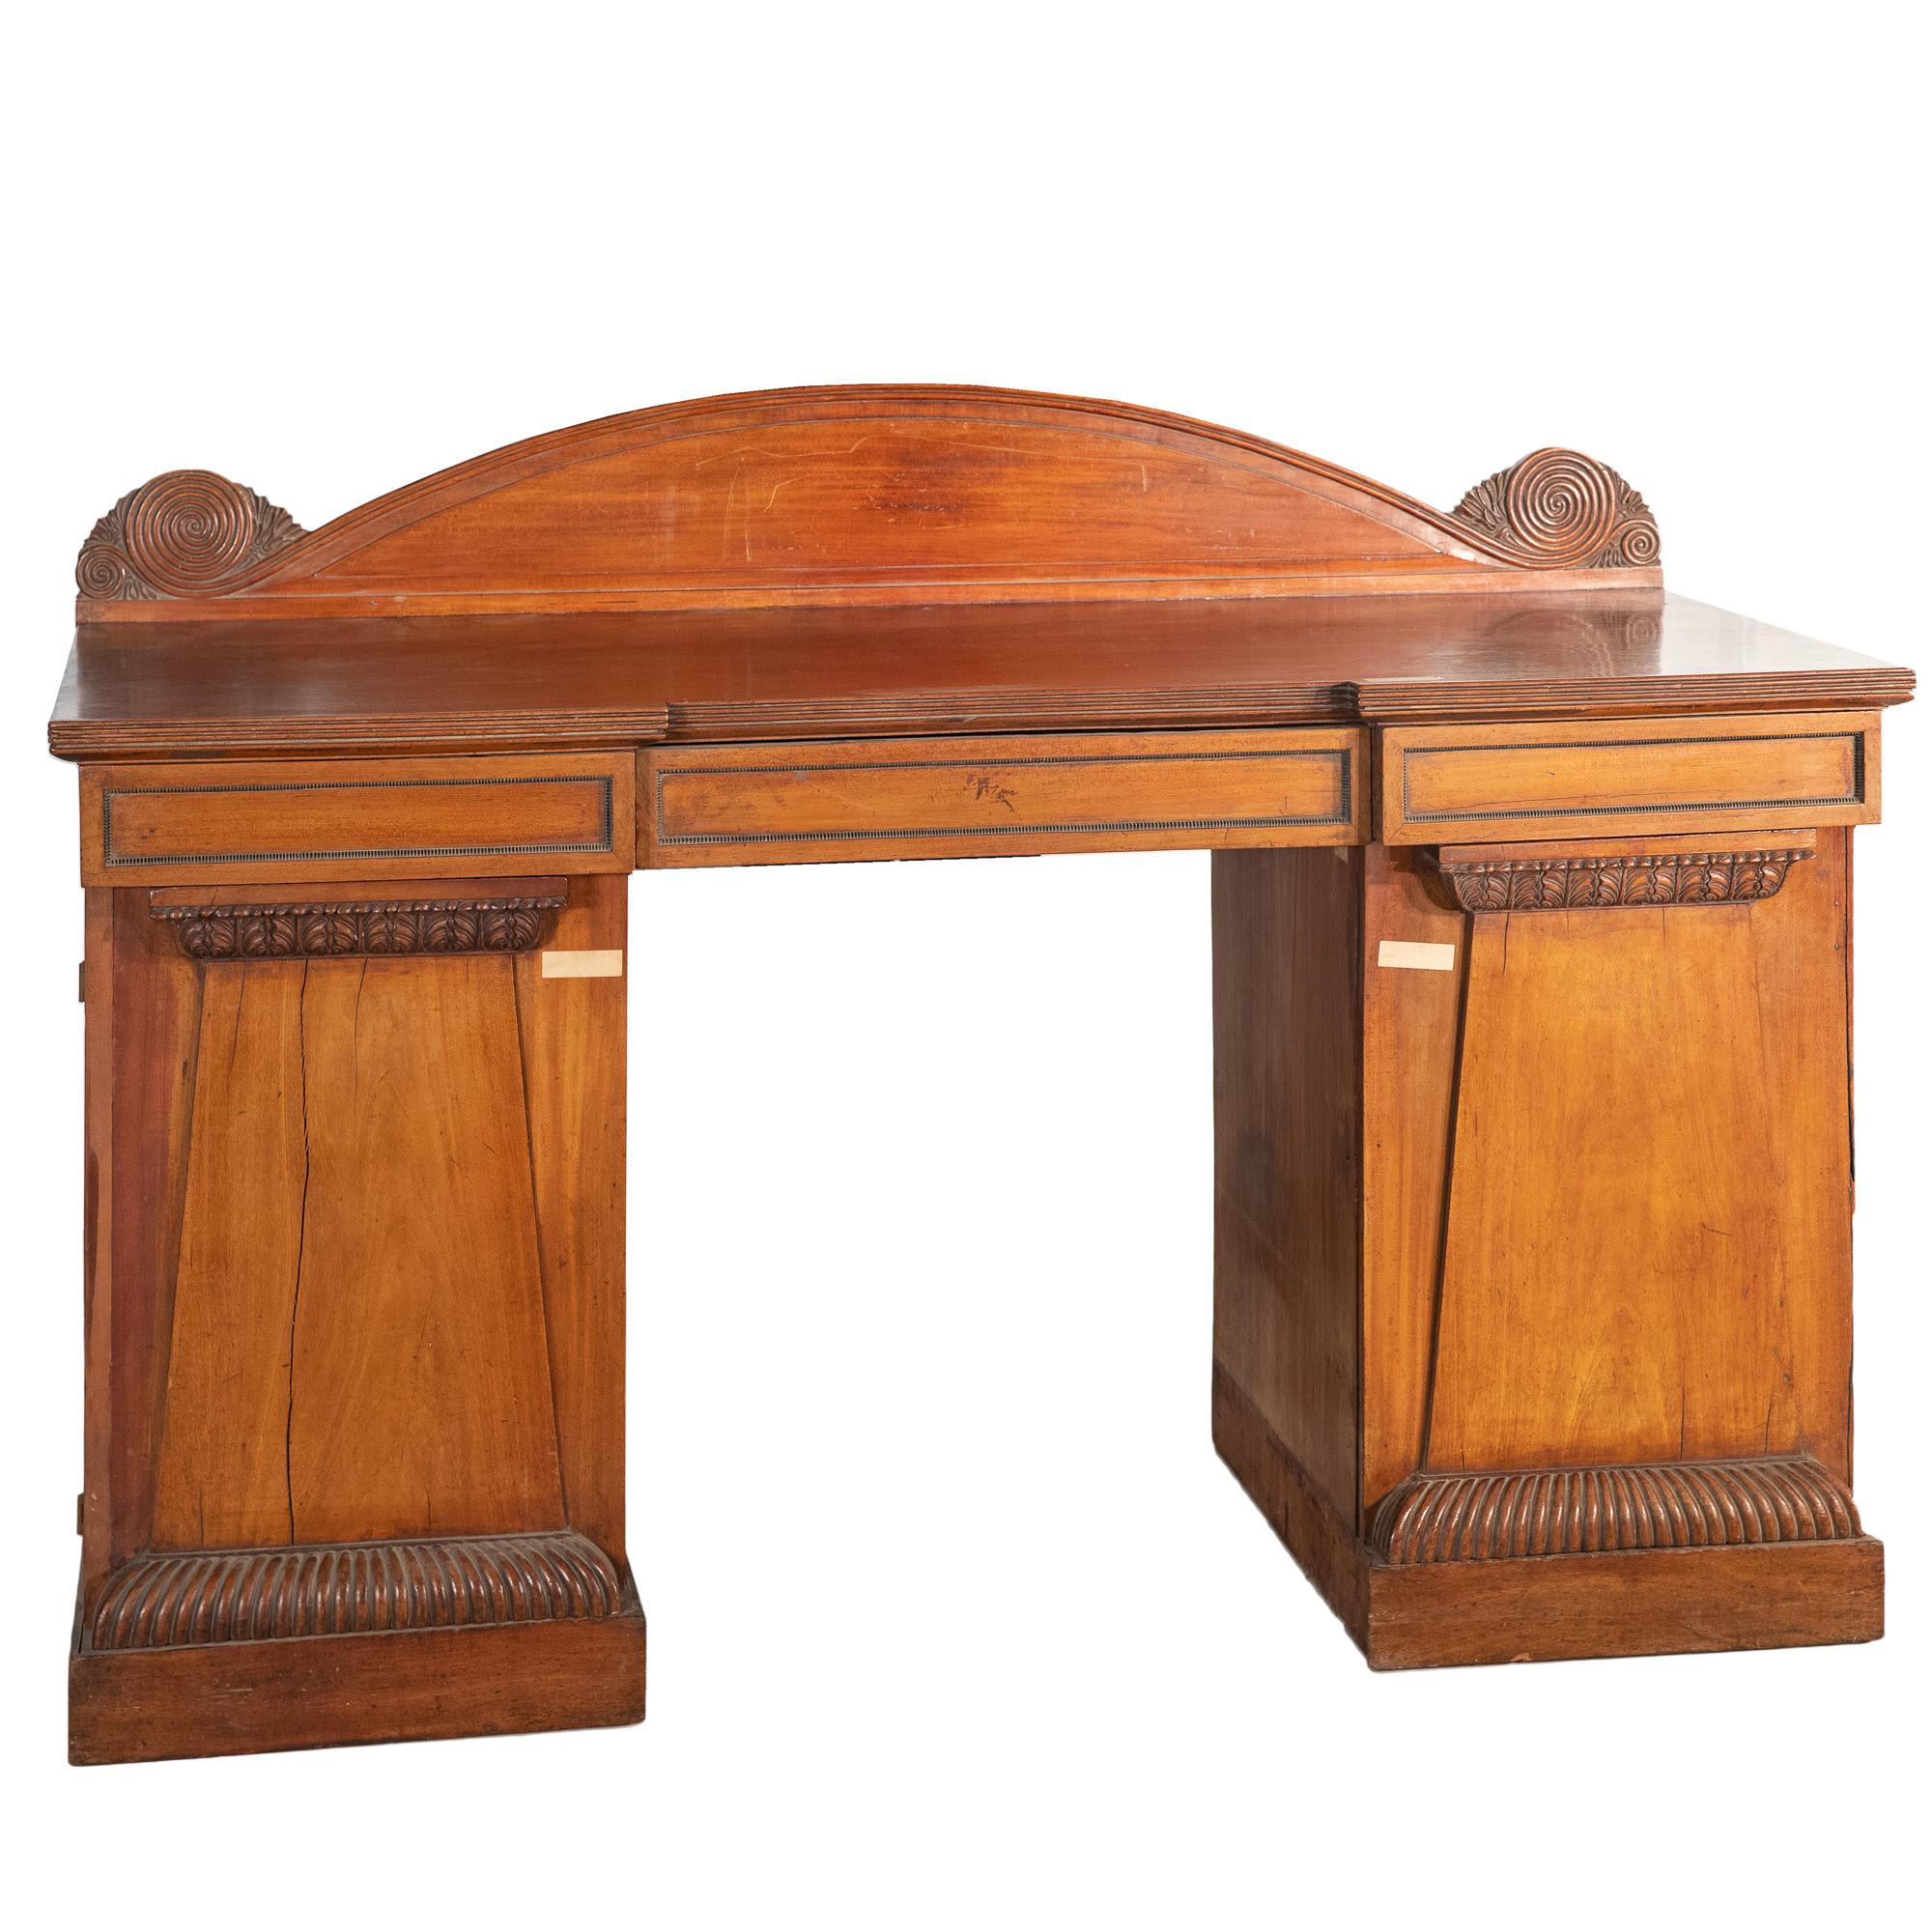 'Regency Mahogany Breakfront Pedestal Sideboard Circa 1820'